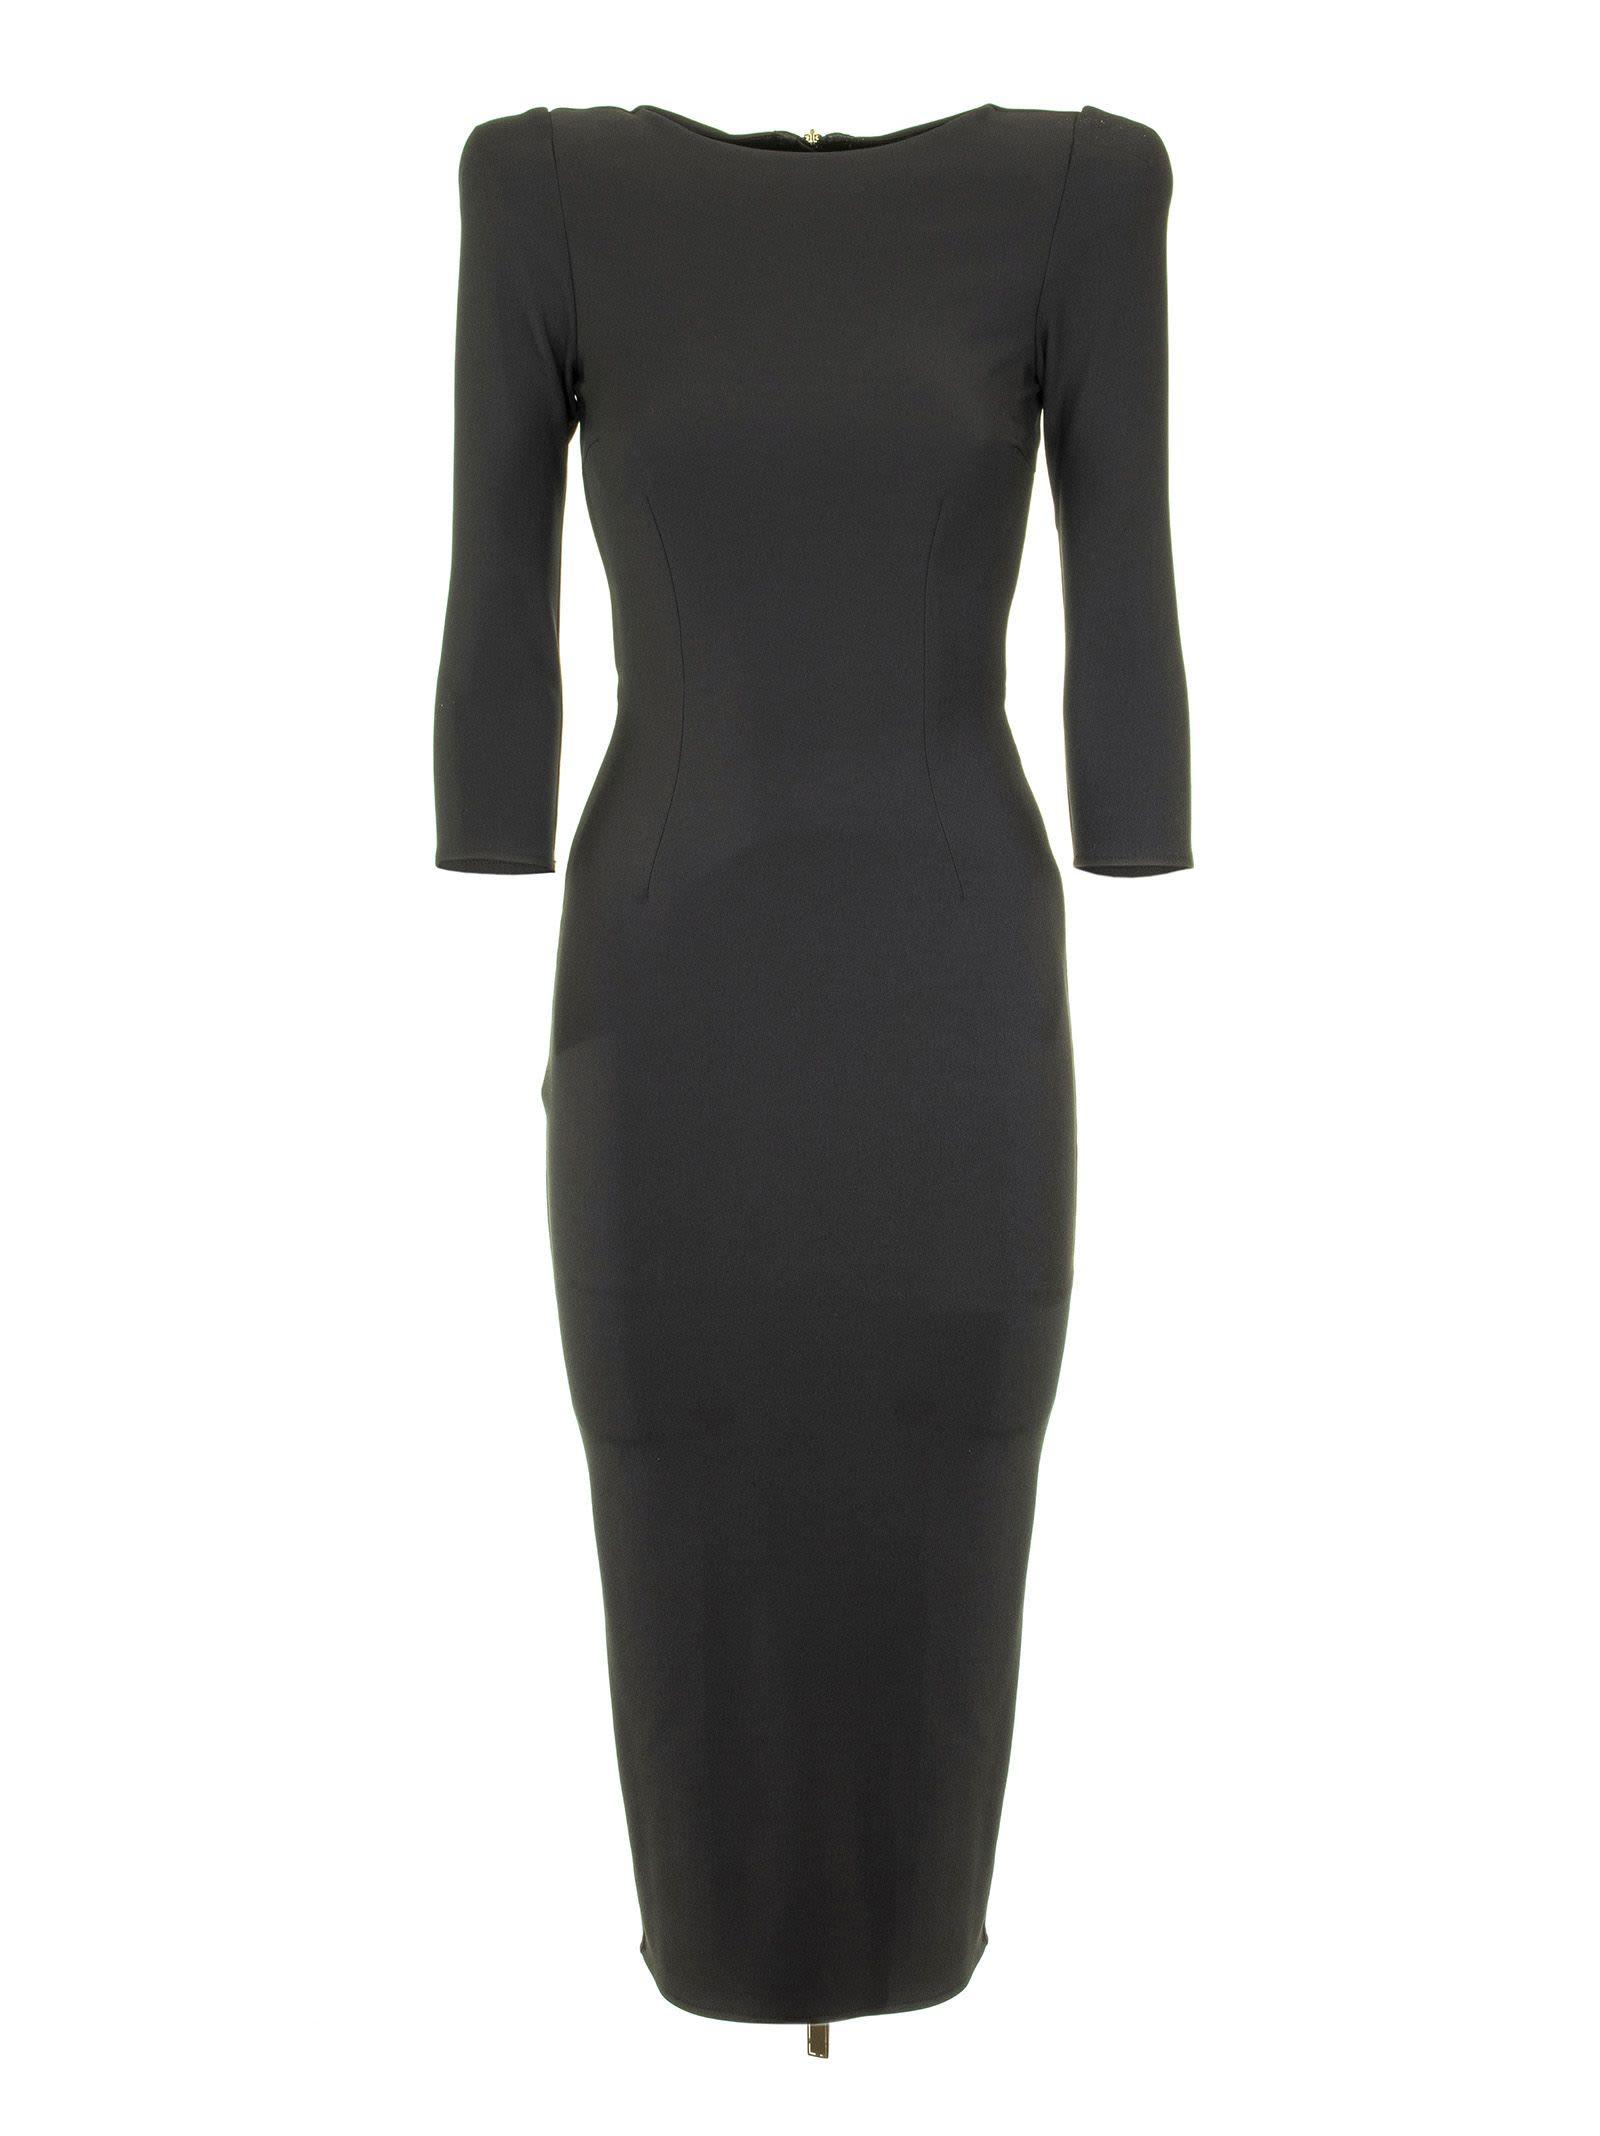 Elisabetta Franchi Celyn B. Calf-length Black Dress